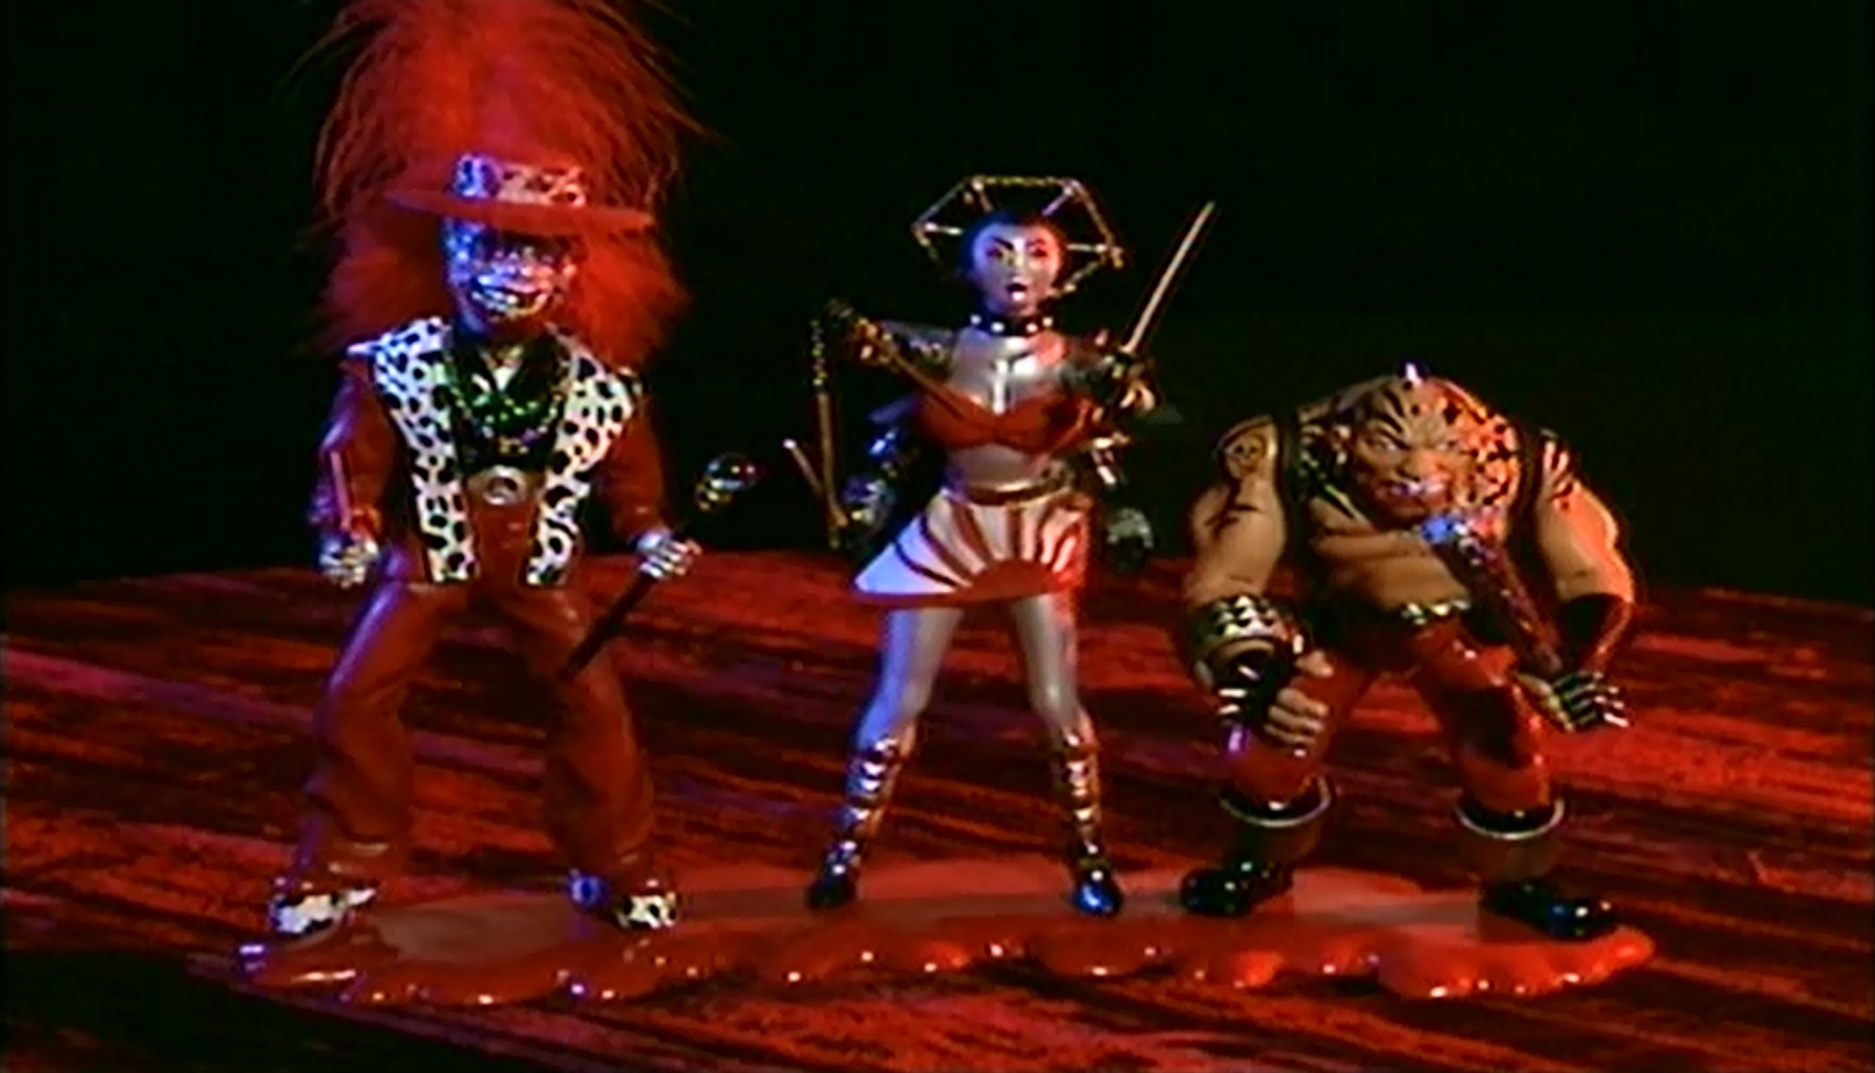 The dolls in Blood Dolls (1999)